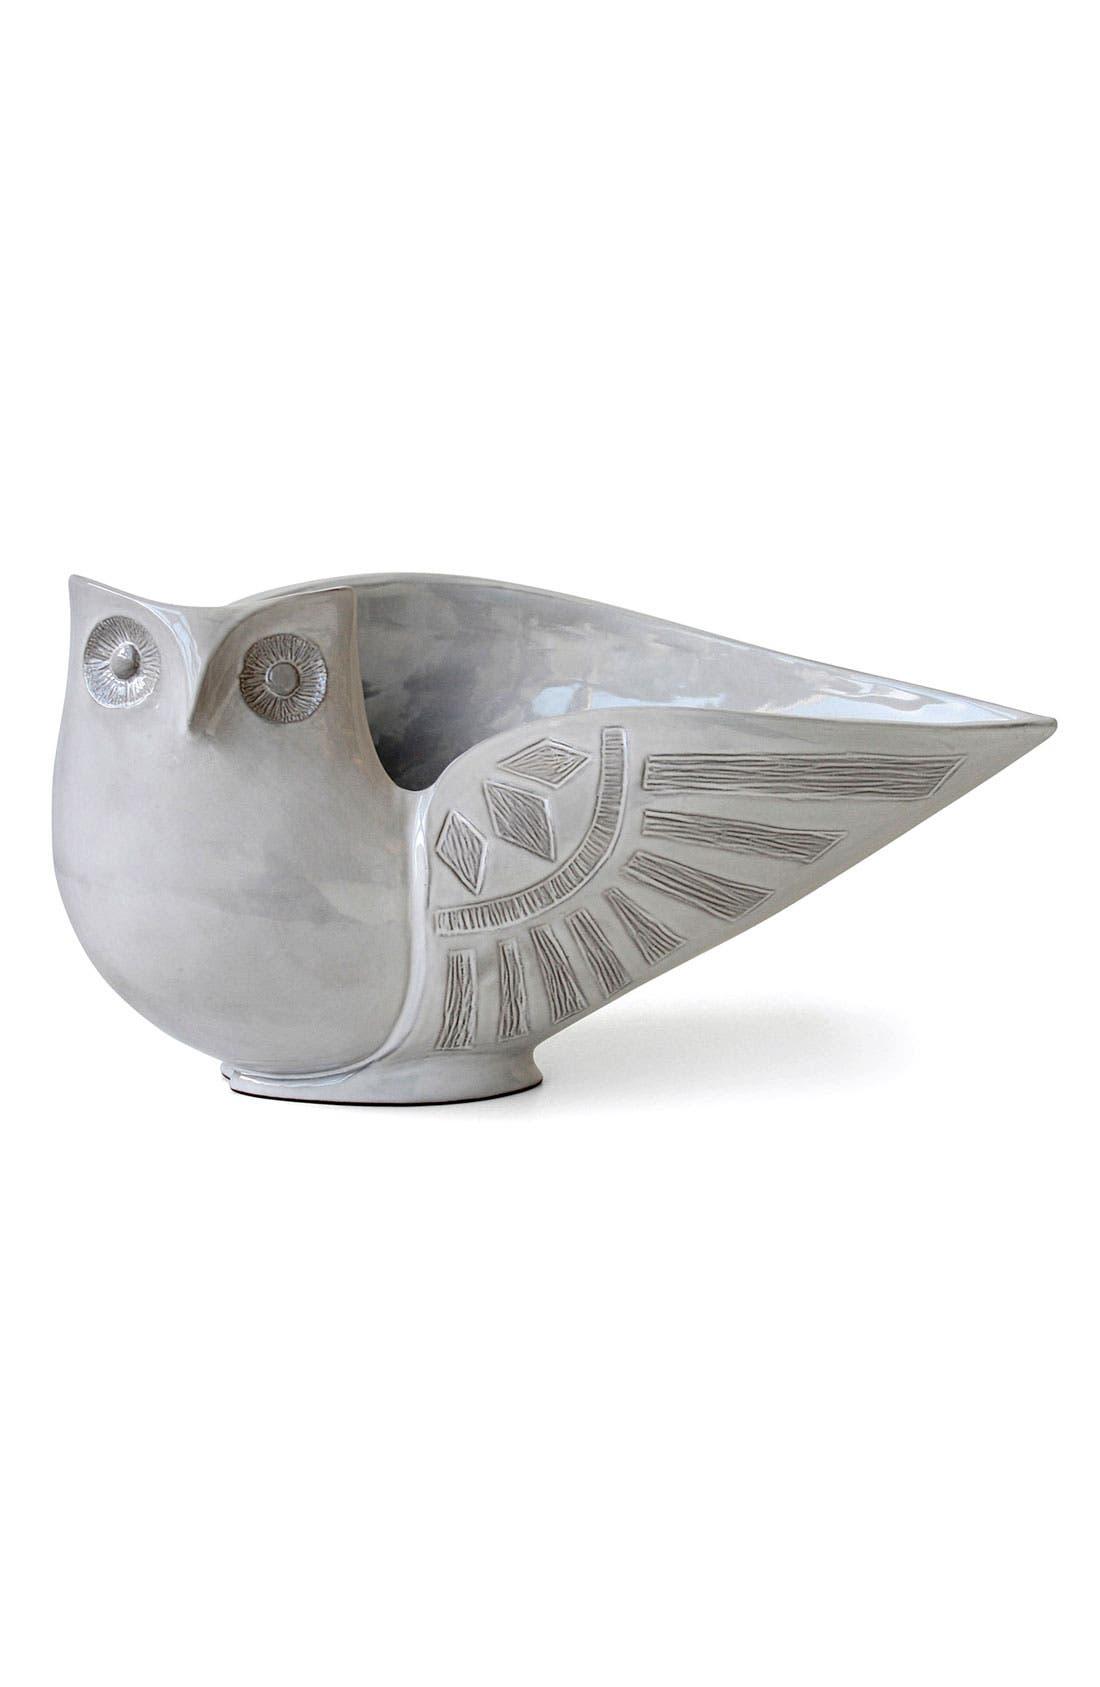 Main Image - Jonathan Adler 'Utopia' Owl Bowl